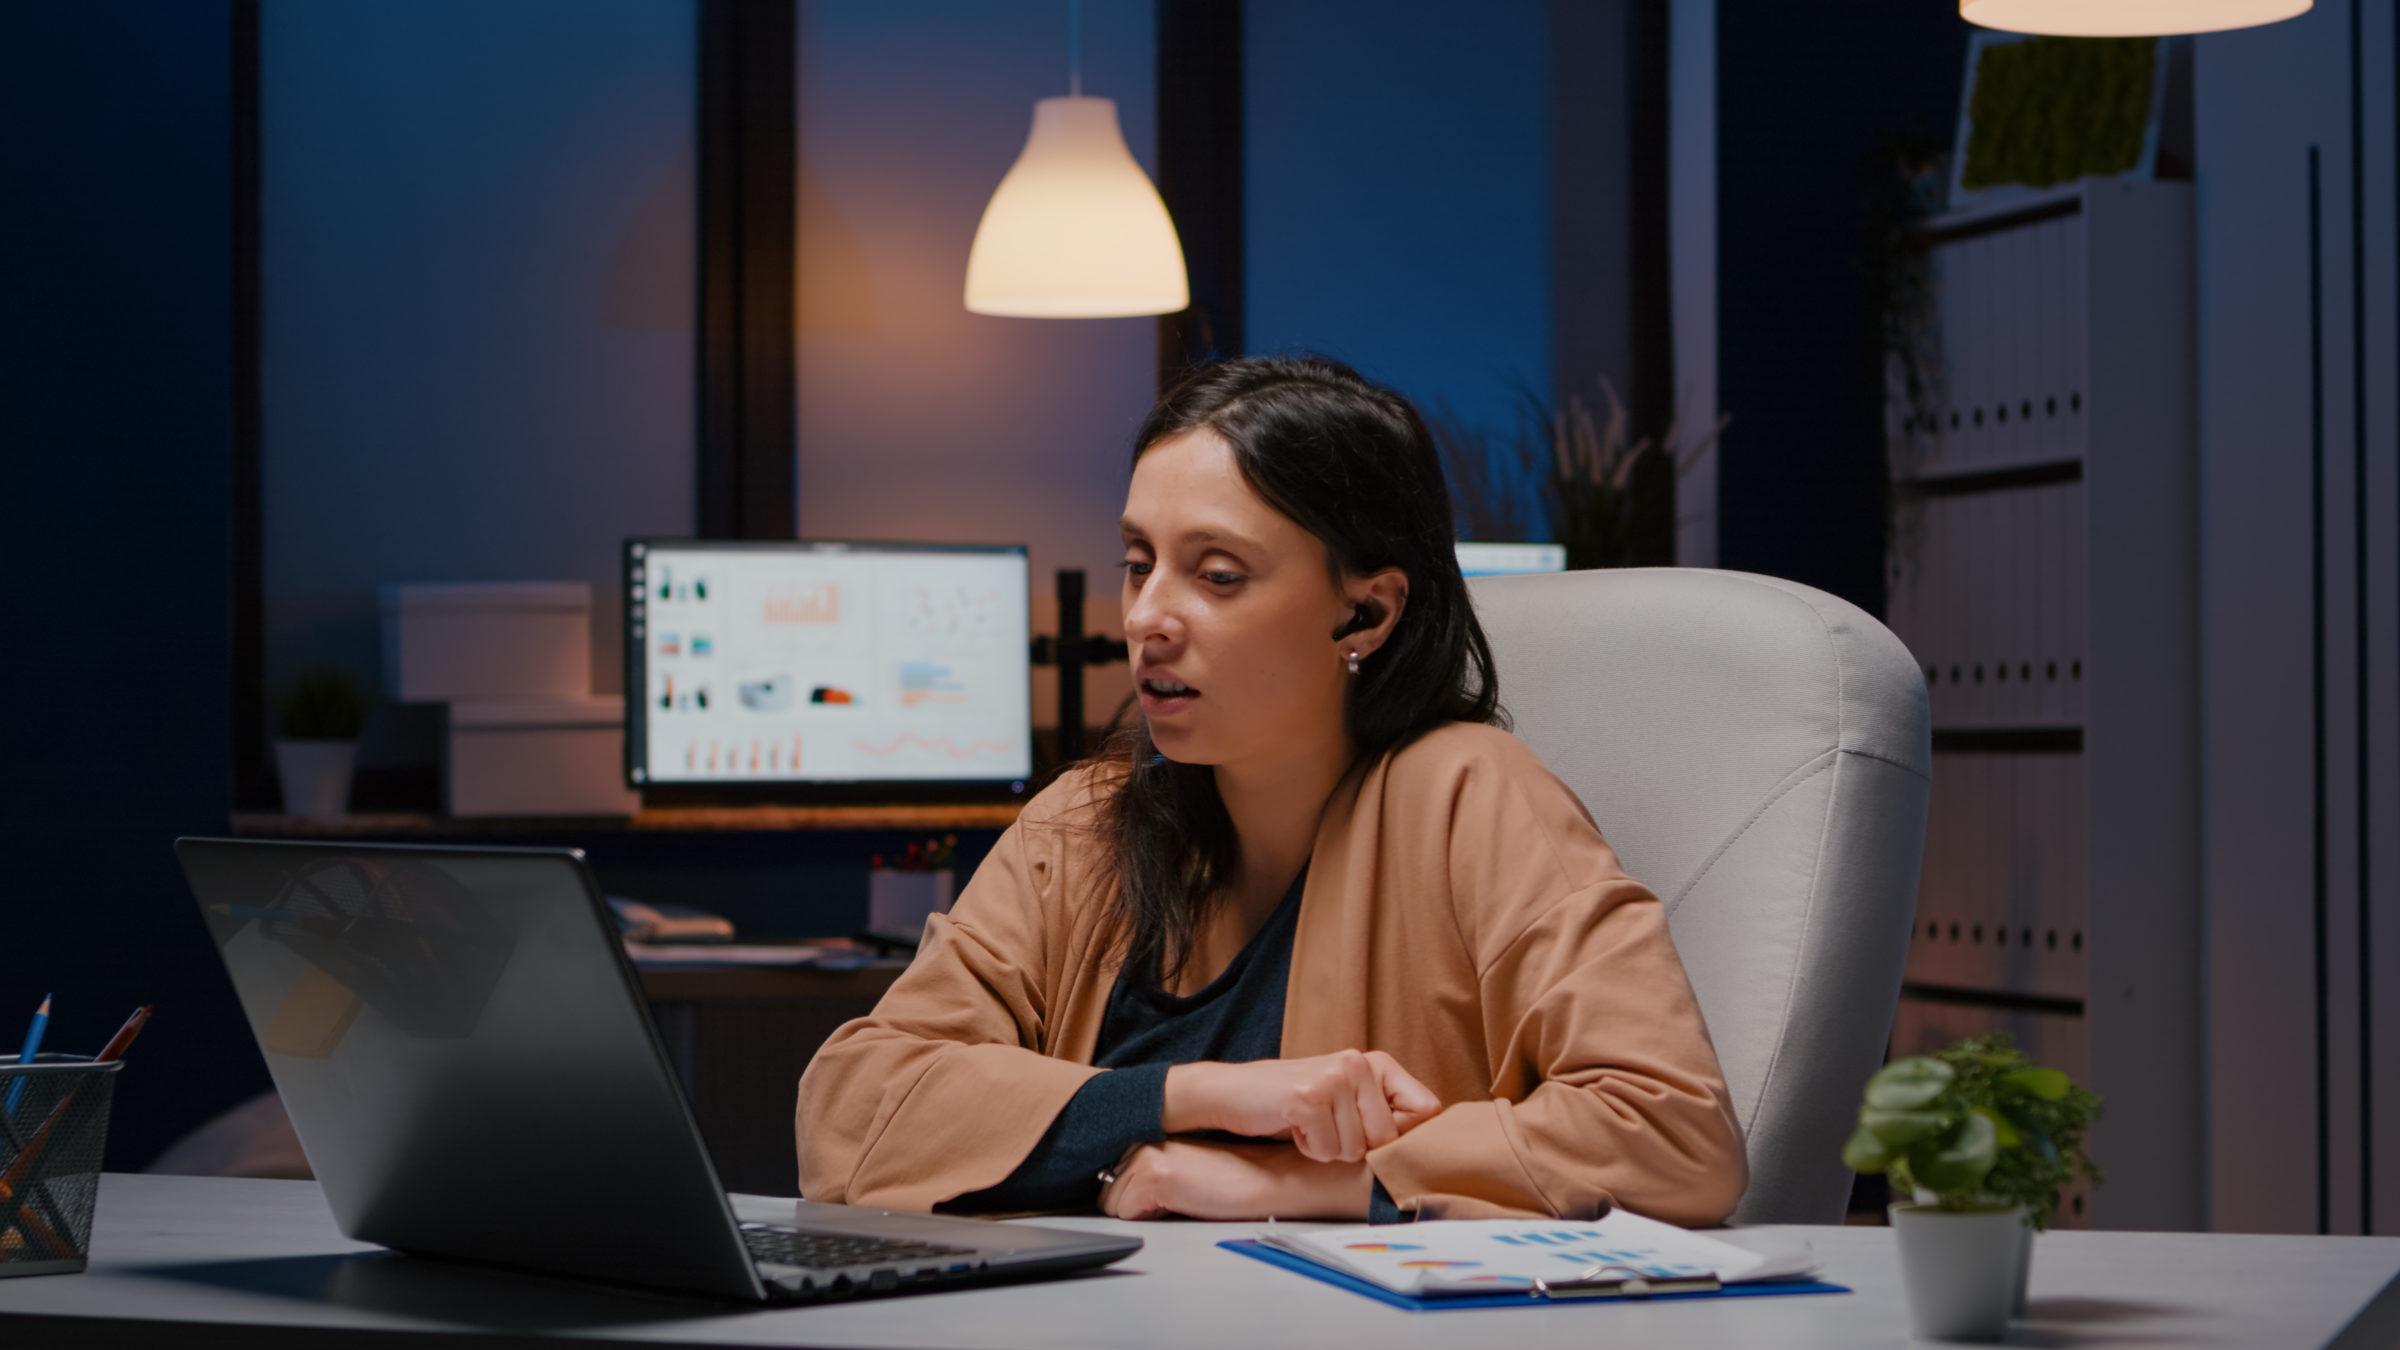 businesswoman with headphones discussing marketing 2021 06 10 20 24 49 utc